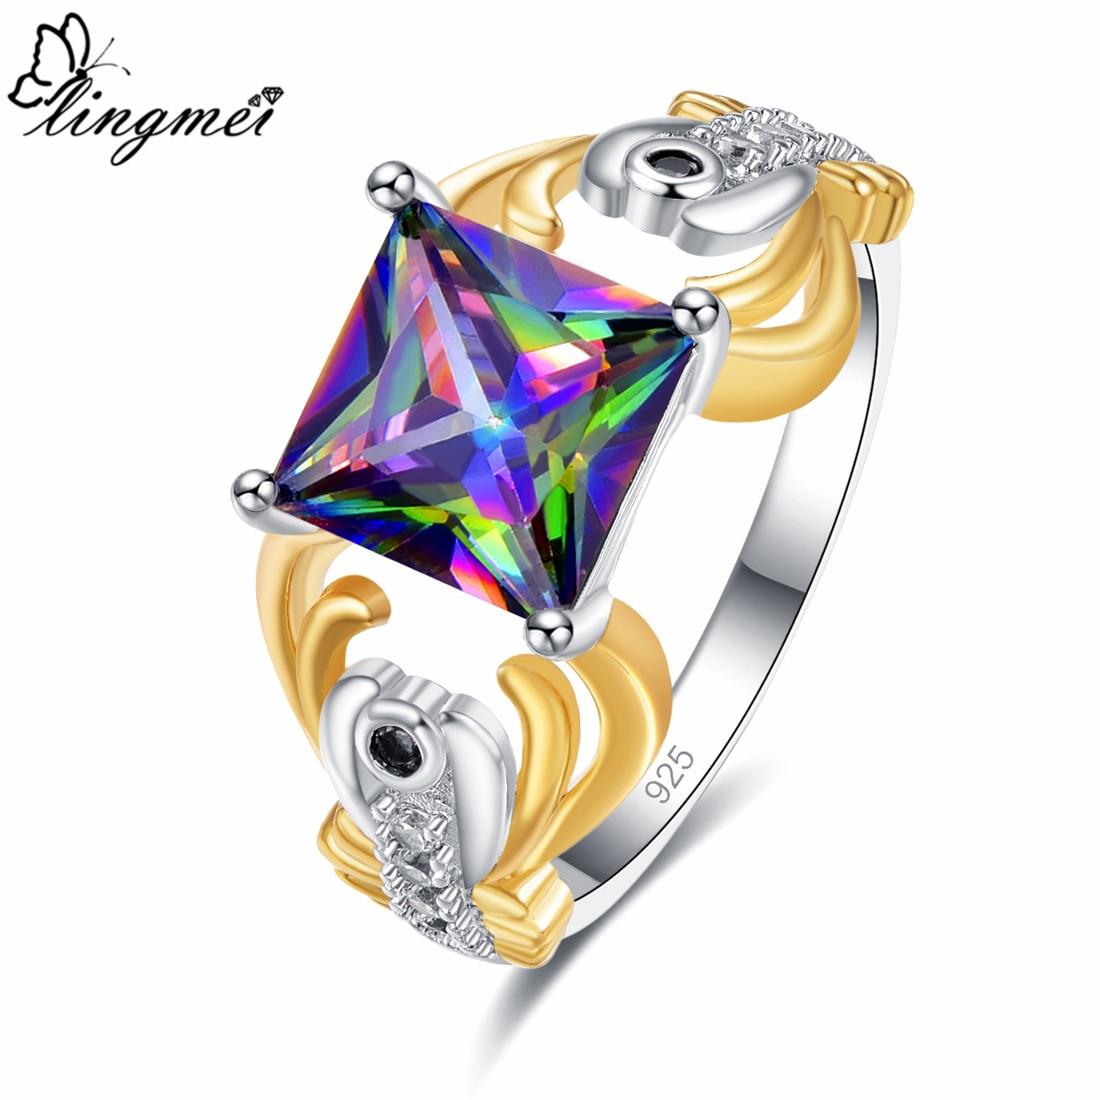 Lingmei Drop shipping Womens Fashion Wedding Band Princess Cut Multicolor & Red Zircon Silver Two Tone Ring Size 6 7 8 9